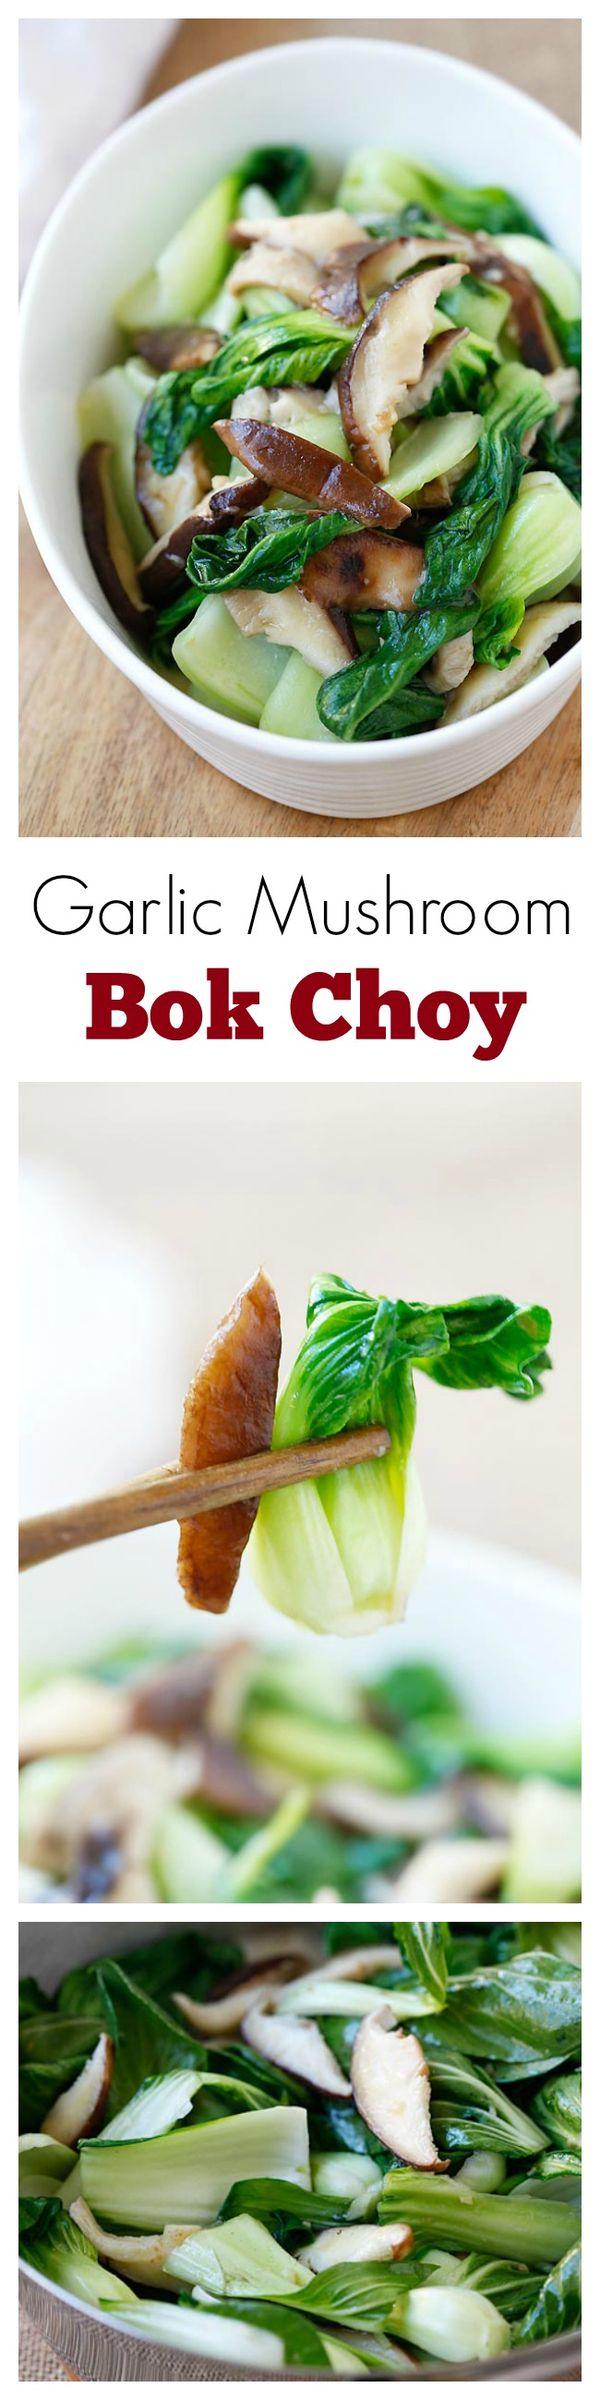 Garlic Mushroom Bok Choy – the easiest, healthiest, and best veggie dish with bok choy, mushroom and garlic. 3 ingredients & 10 minutes to make | rasamalaysia.com